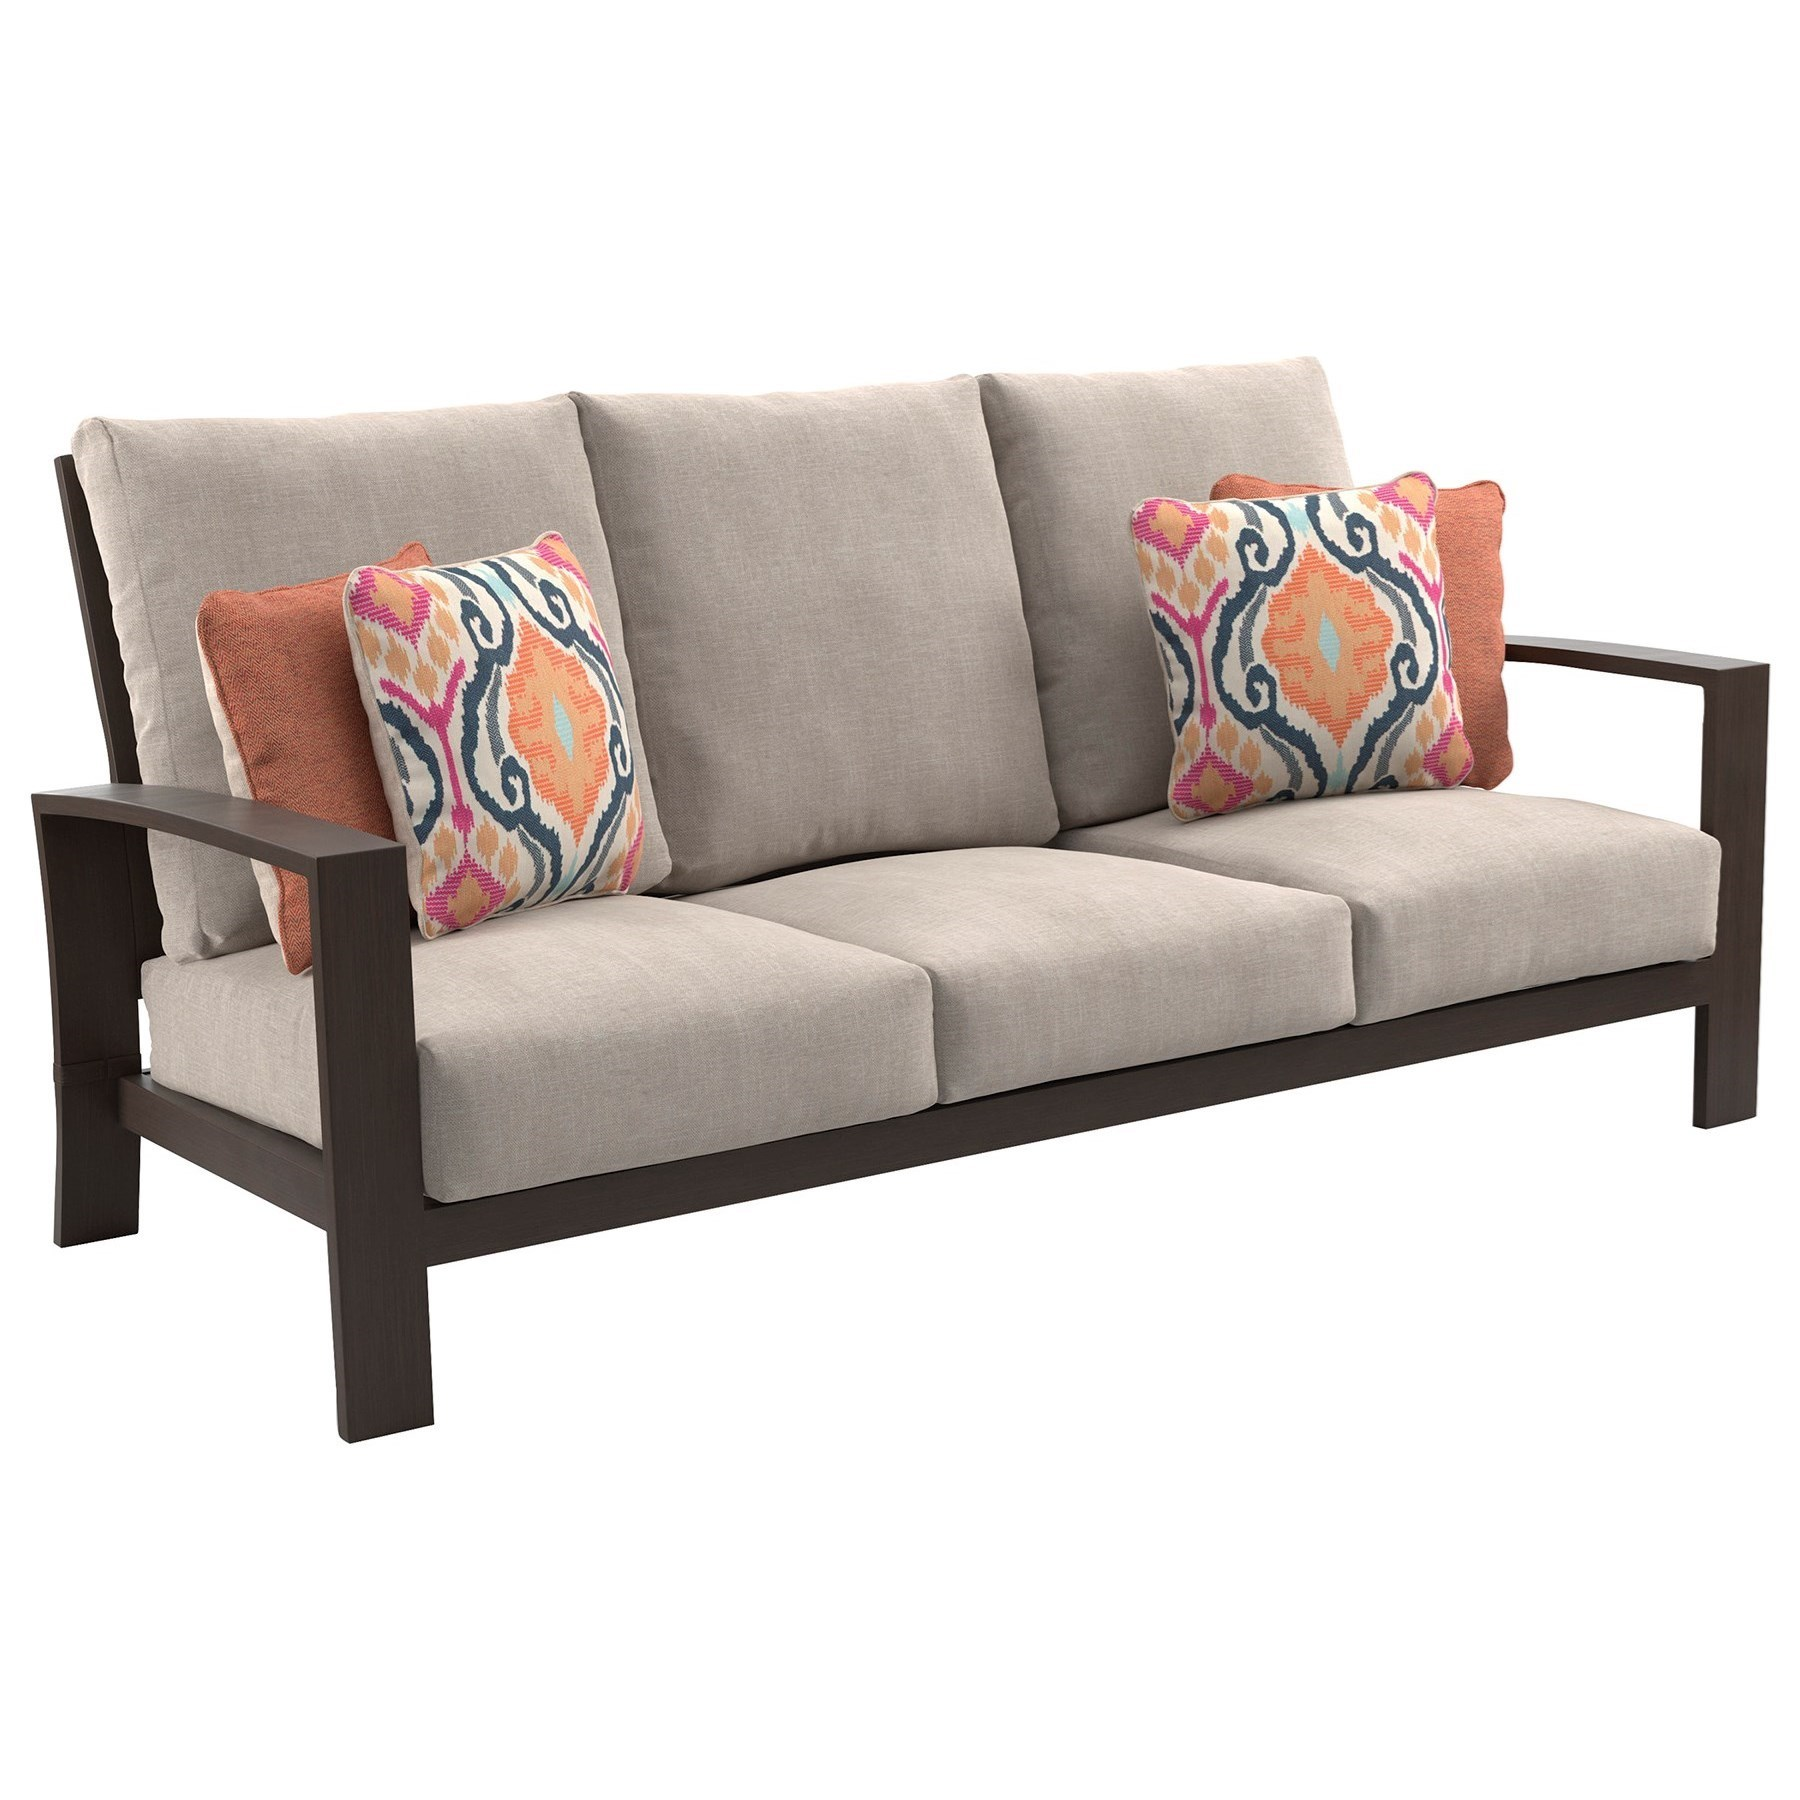 Signature Design By Ashley Cordova ReefSofa With Cushion ...